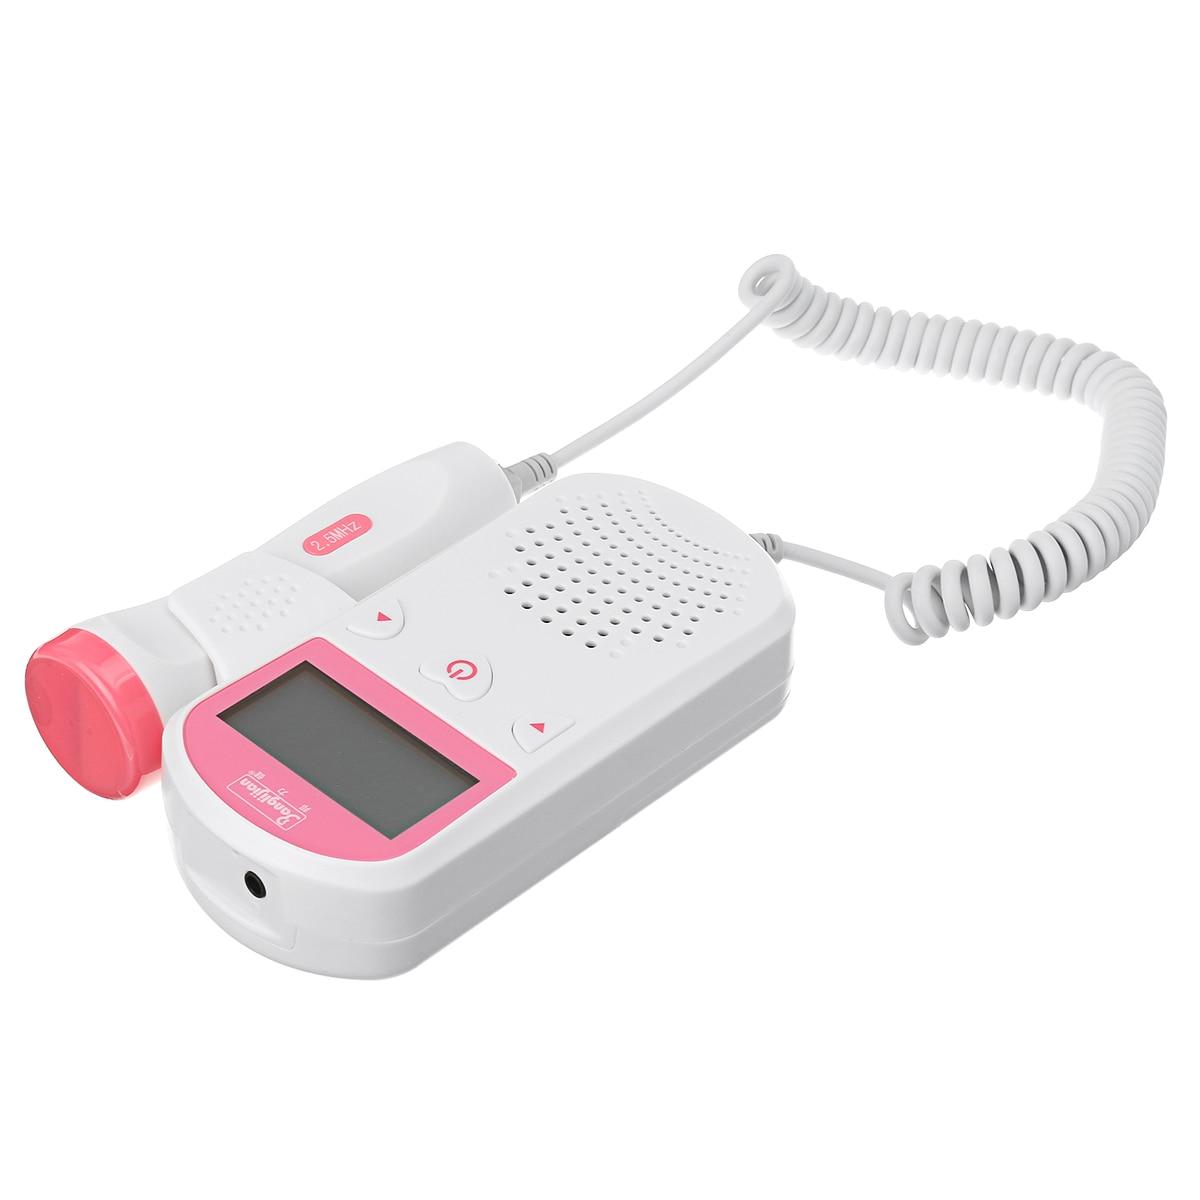 Digital LCD Prenatal Fetal Doppler Heart Sound Monitor Screen Display Tester Detector Pregnant FetalPulse Meter Monitors 2.0MHz